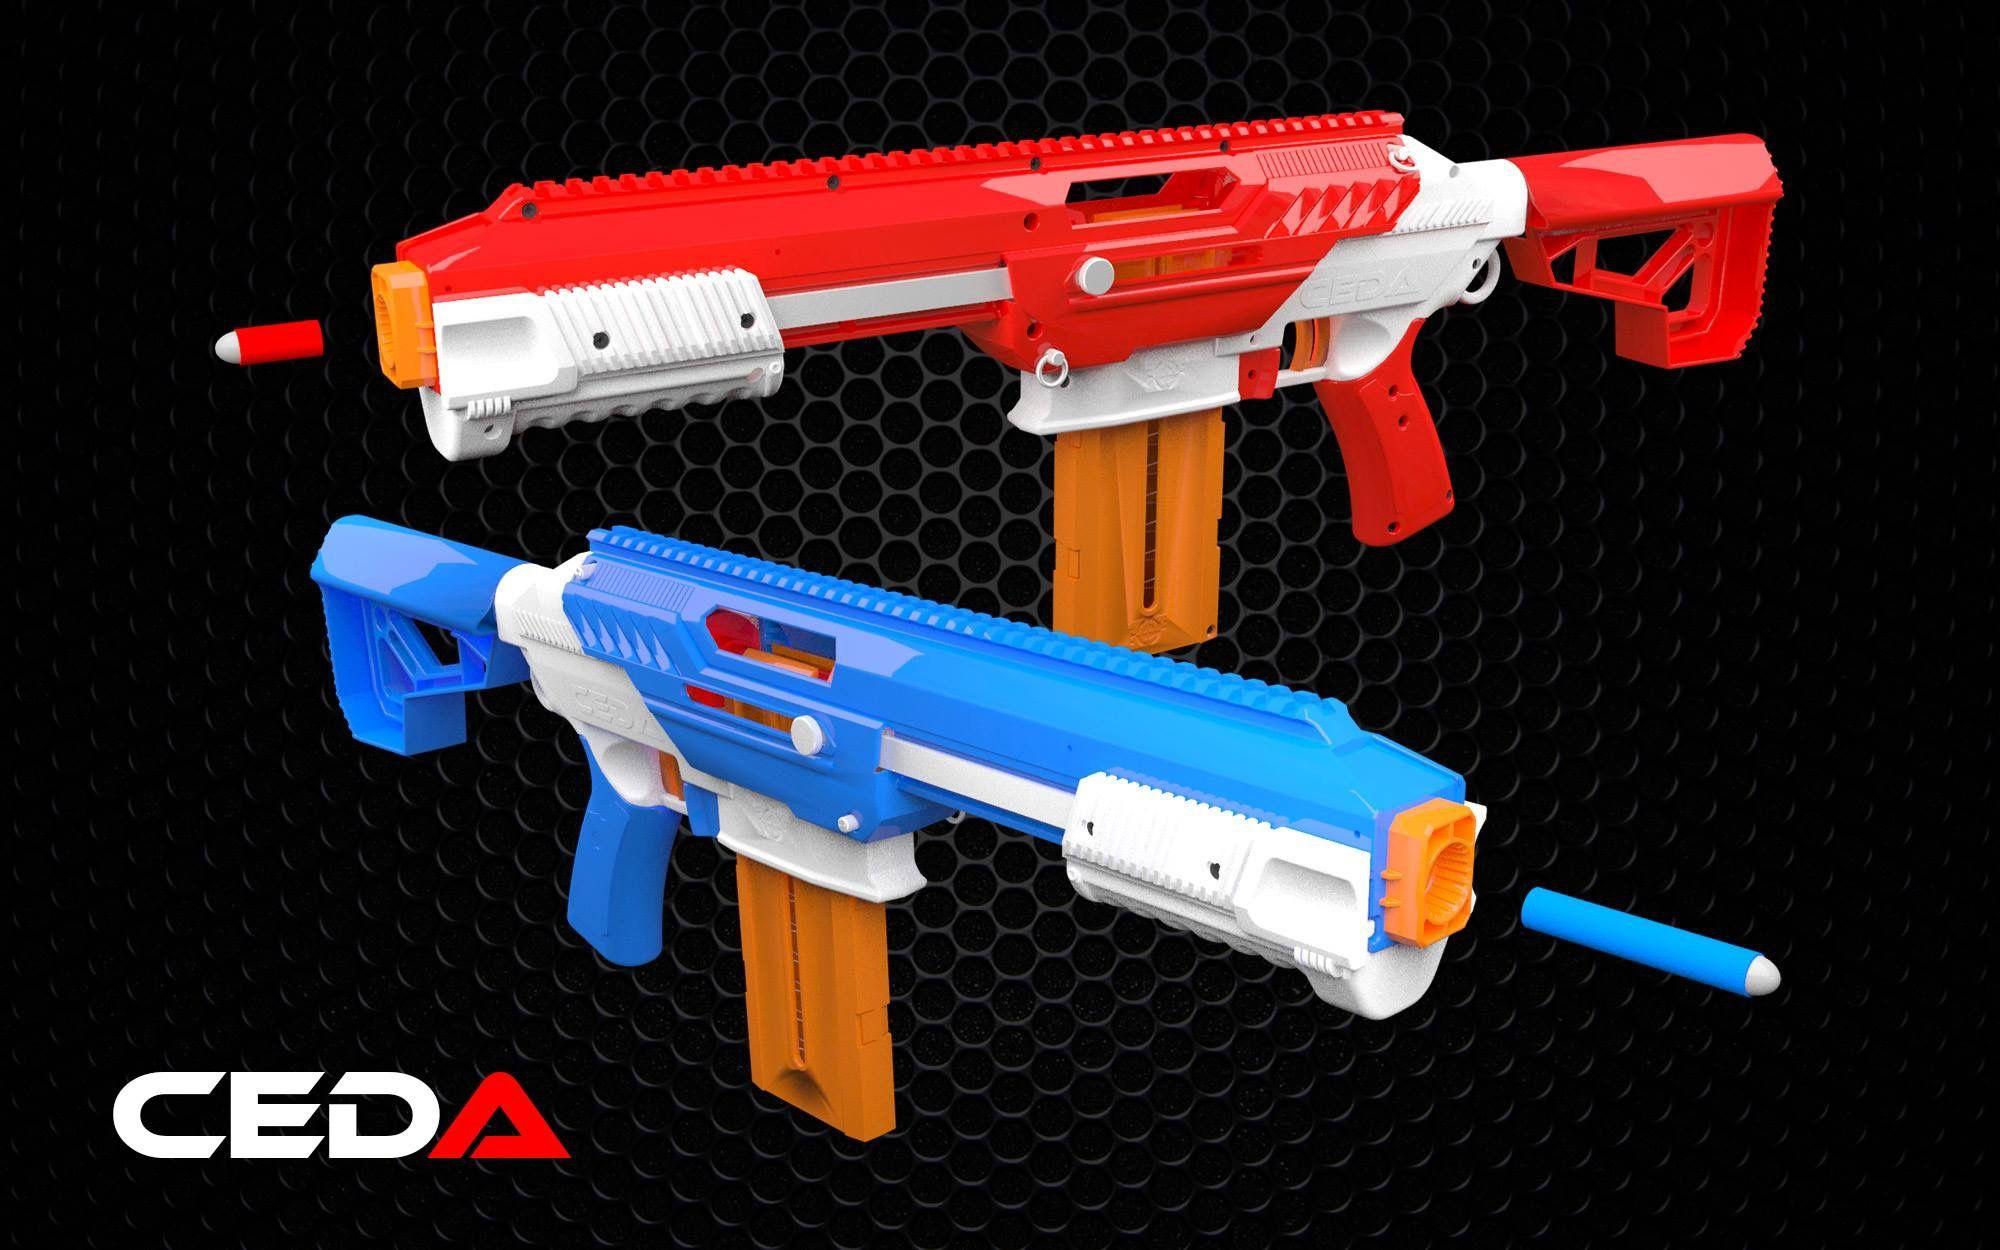 Nerf, Guns, Shopping, Weapons, Weapons Guns, Pistols, Revolvers, Firearms,  Gun